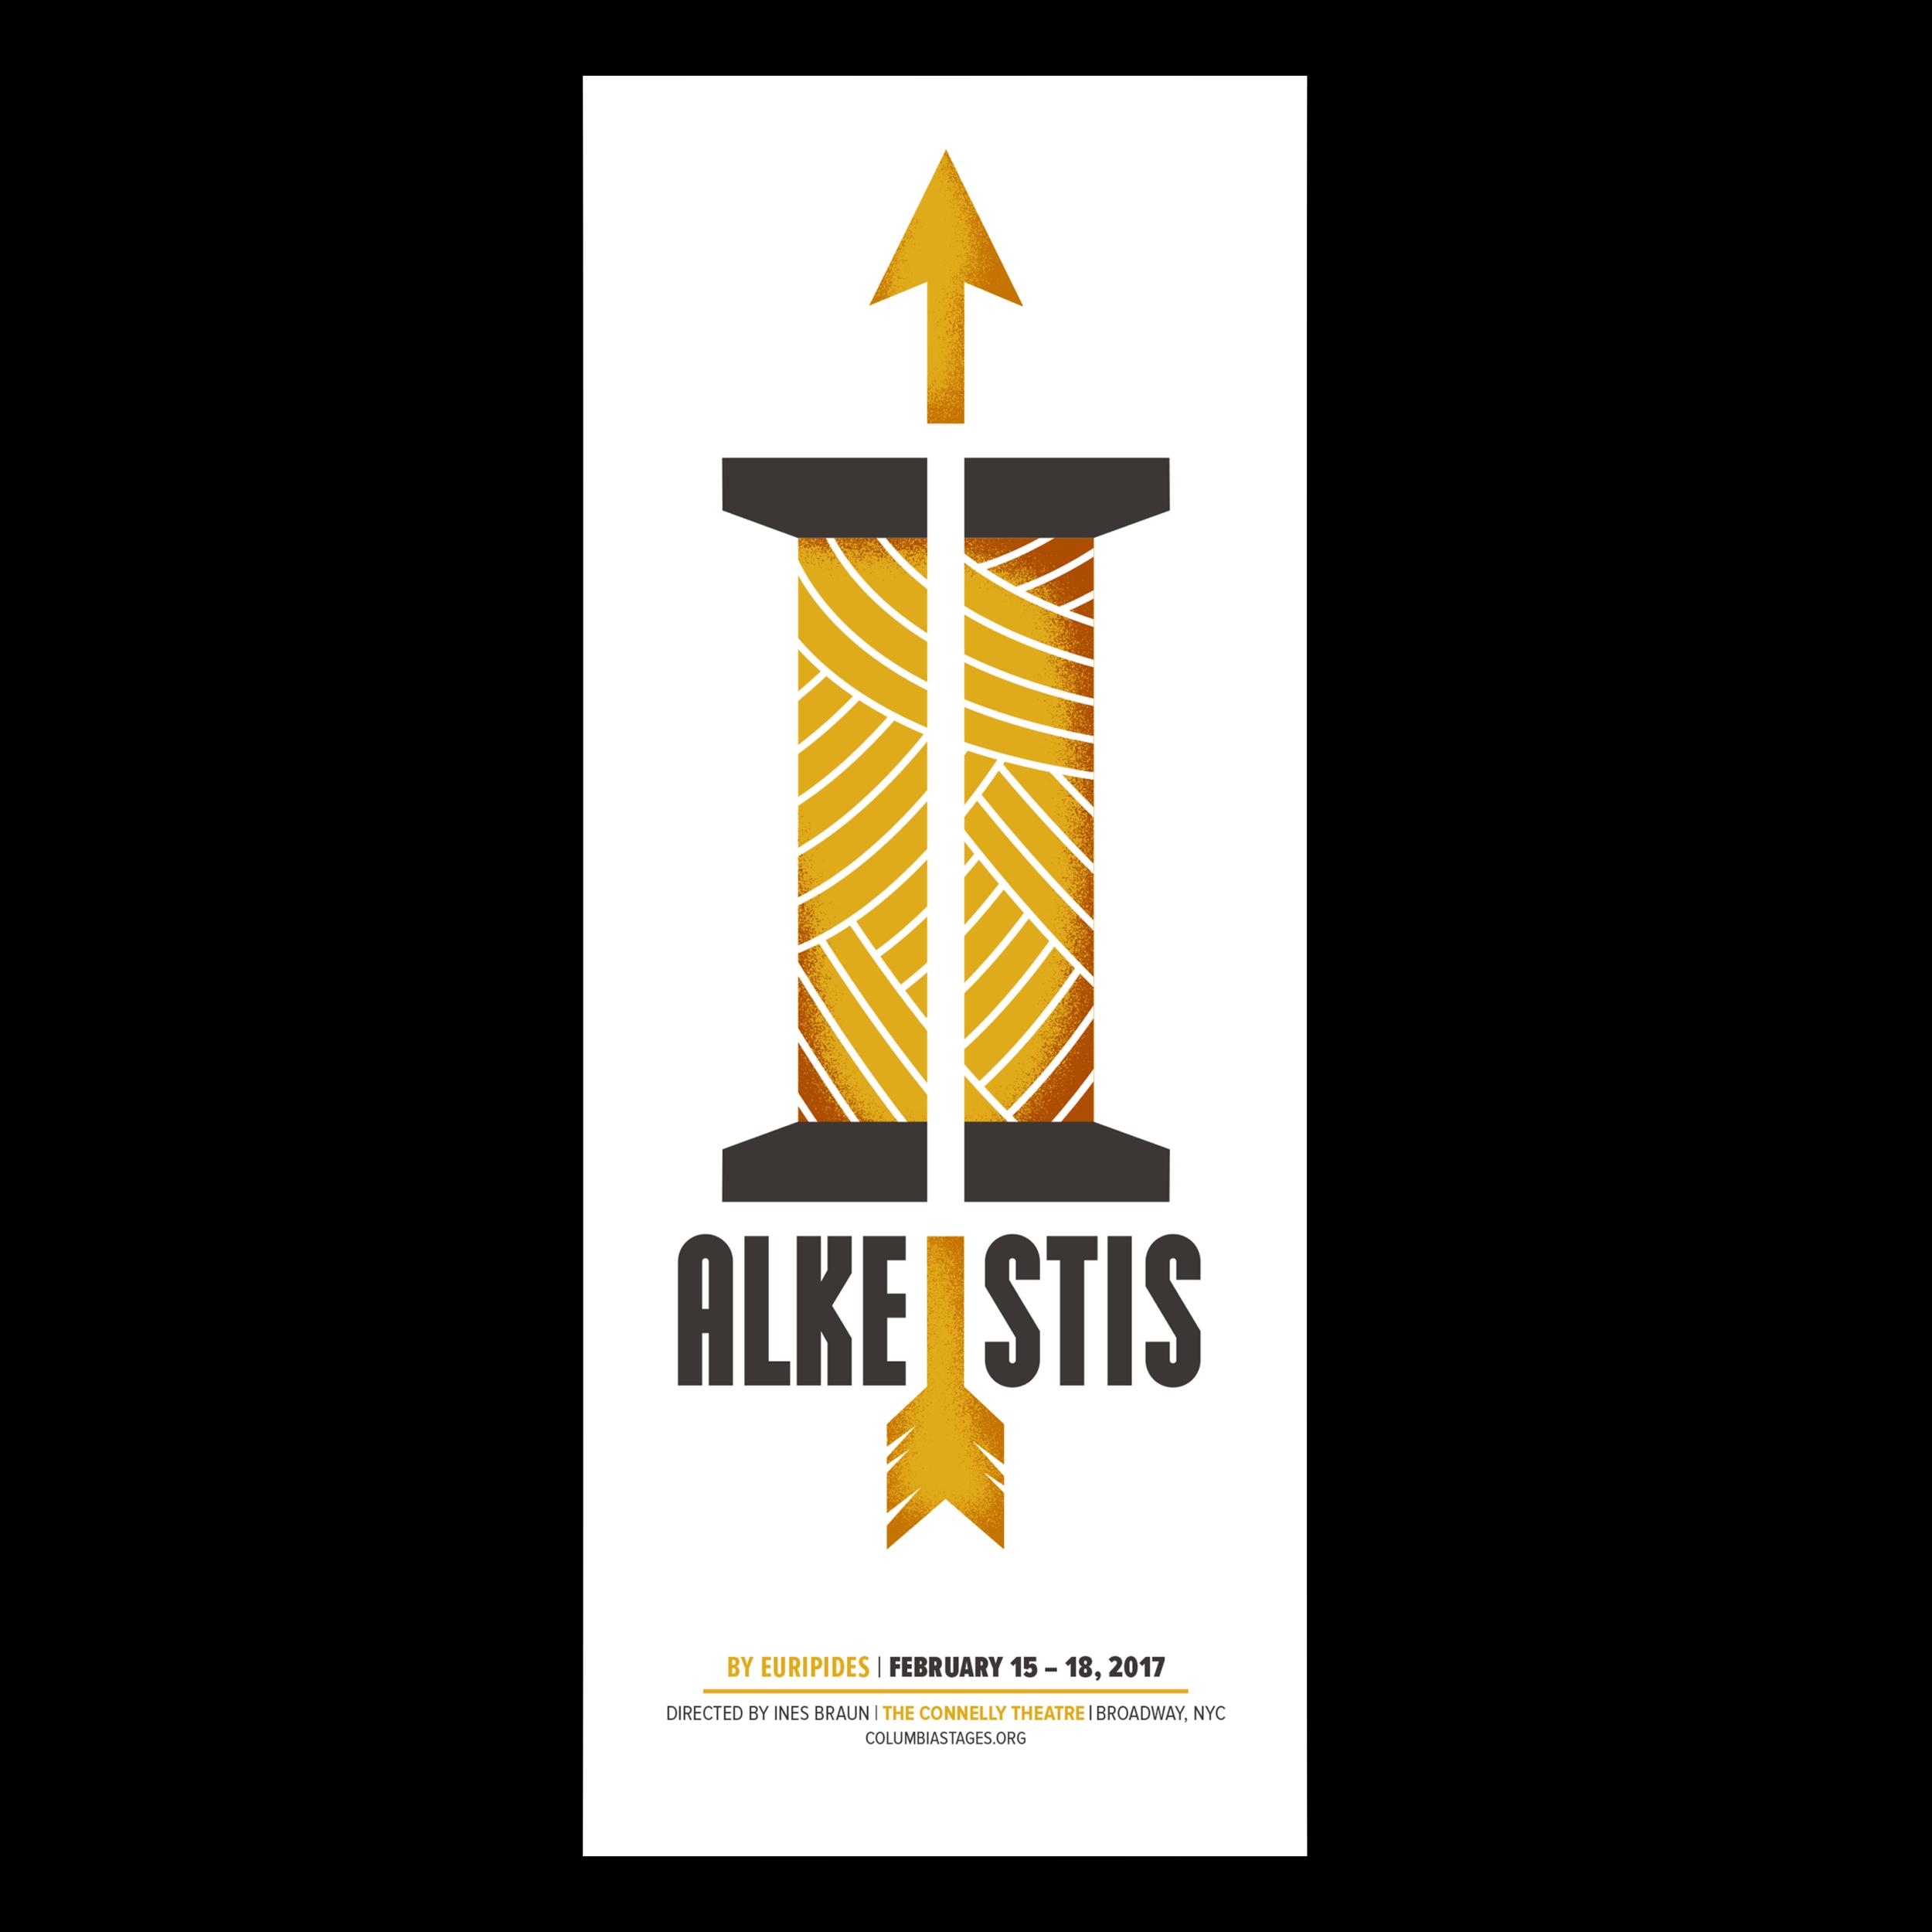 Alkestis_Web.png